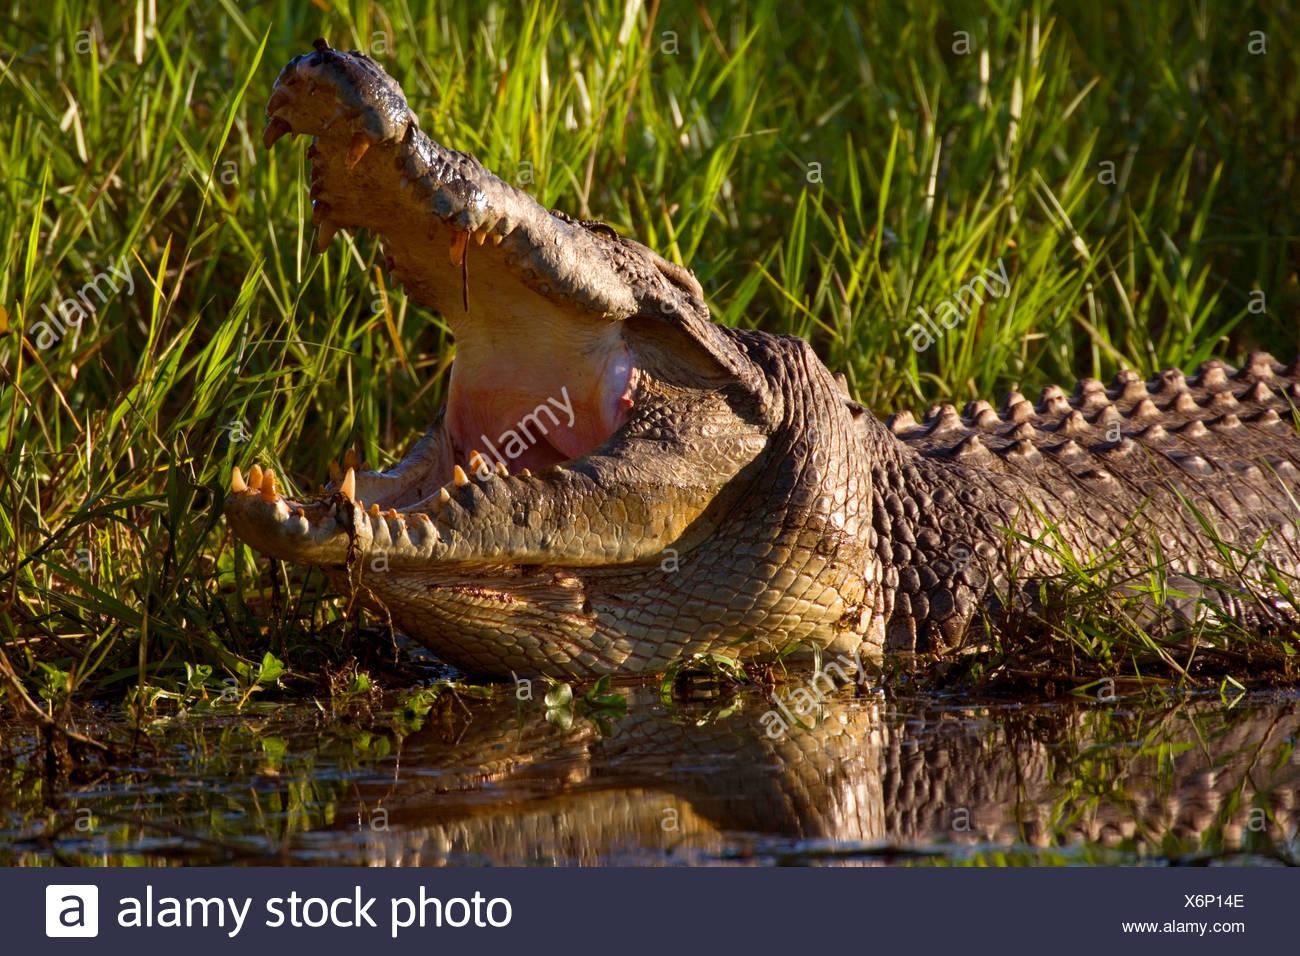 saltwater crocodile, estuarine crocodile (Crocodylus porosus), big Saltwater Crocodile lying at shore of a swamp with open snout showing off its big and dangerous teeth, Australia, Northern Territory - Stock Image